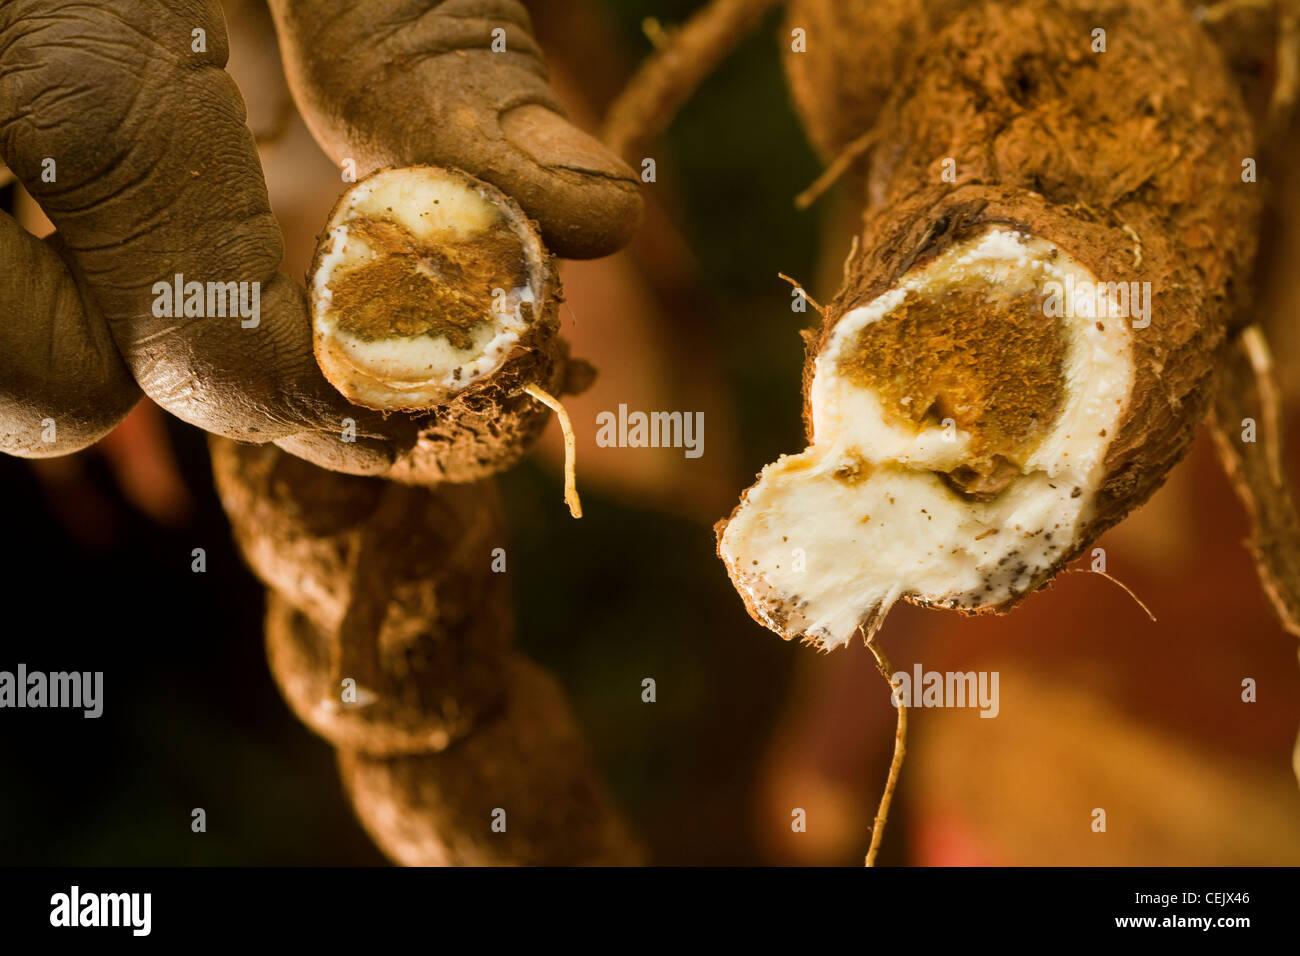 Hands Holding Diseased Cassava - Stock Image